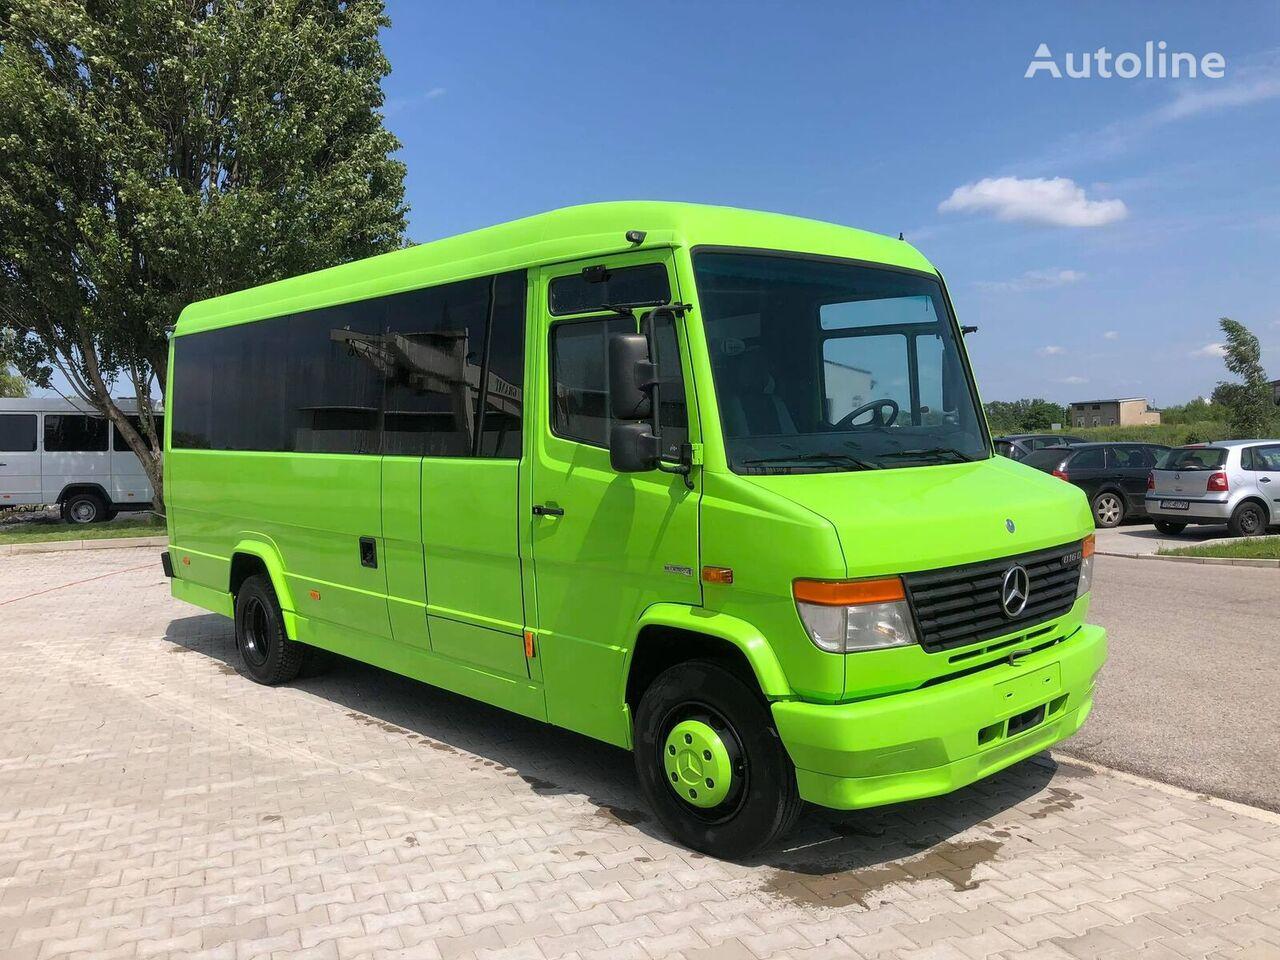 MERCEDES-BENZ vario 816 interurban bus